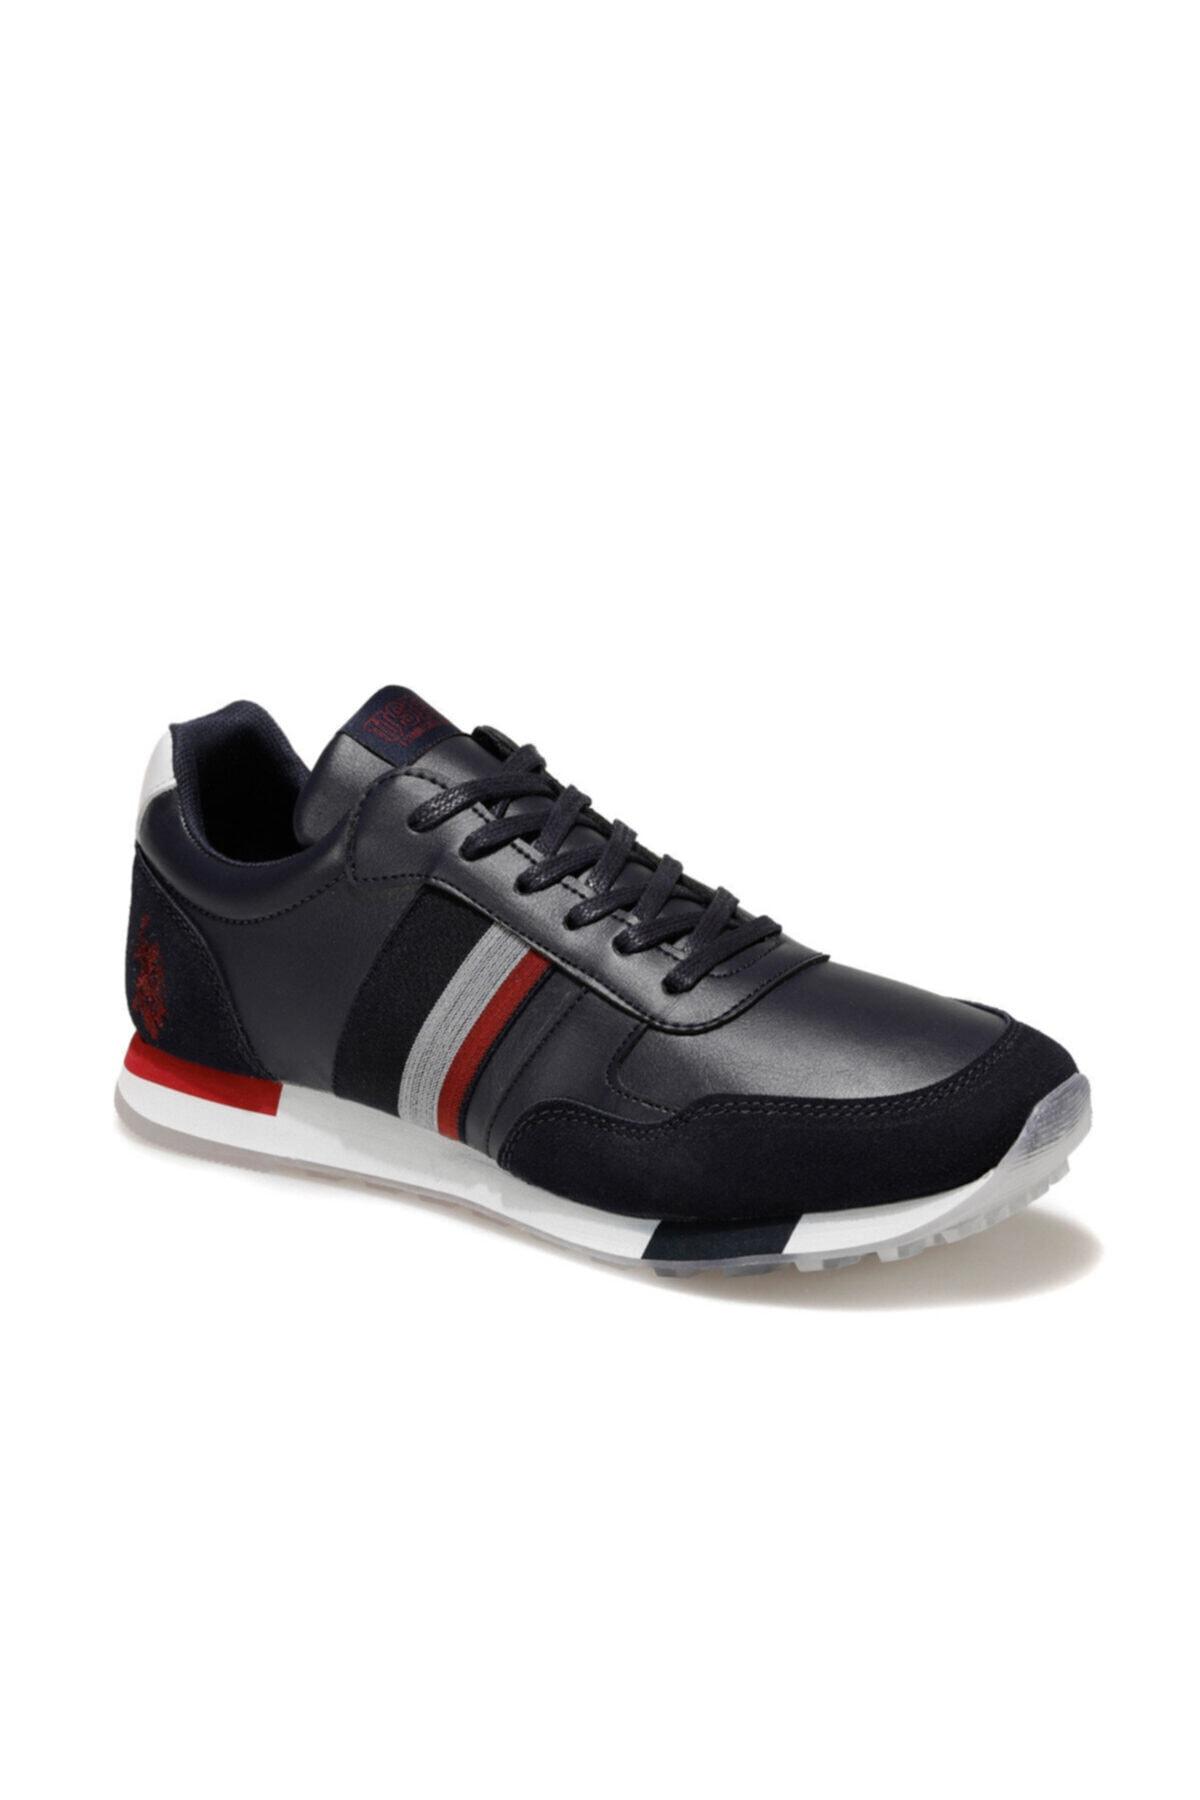 U.S. Polo Assn. BARLIN WT Lacivert Erkek Sneaker Ayakkabı 100551150 1